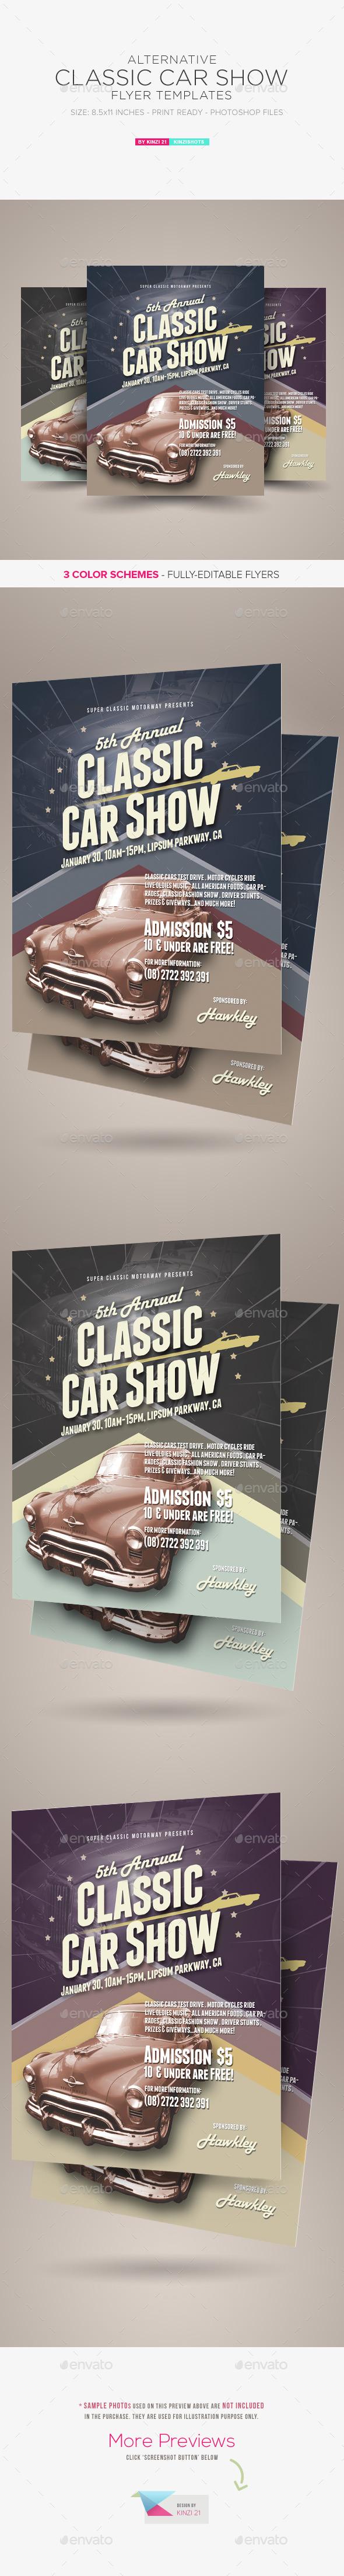 Alternative Classic Car Show Flyers - Miscellaneous Events